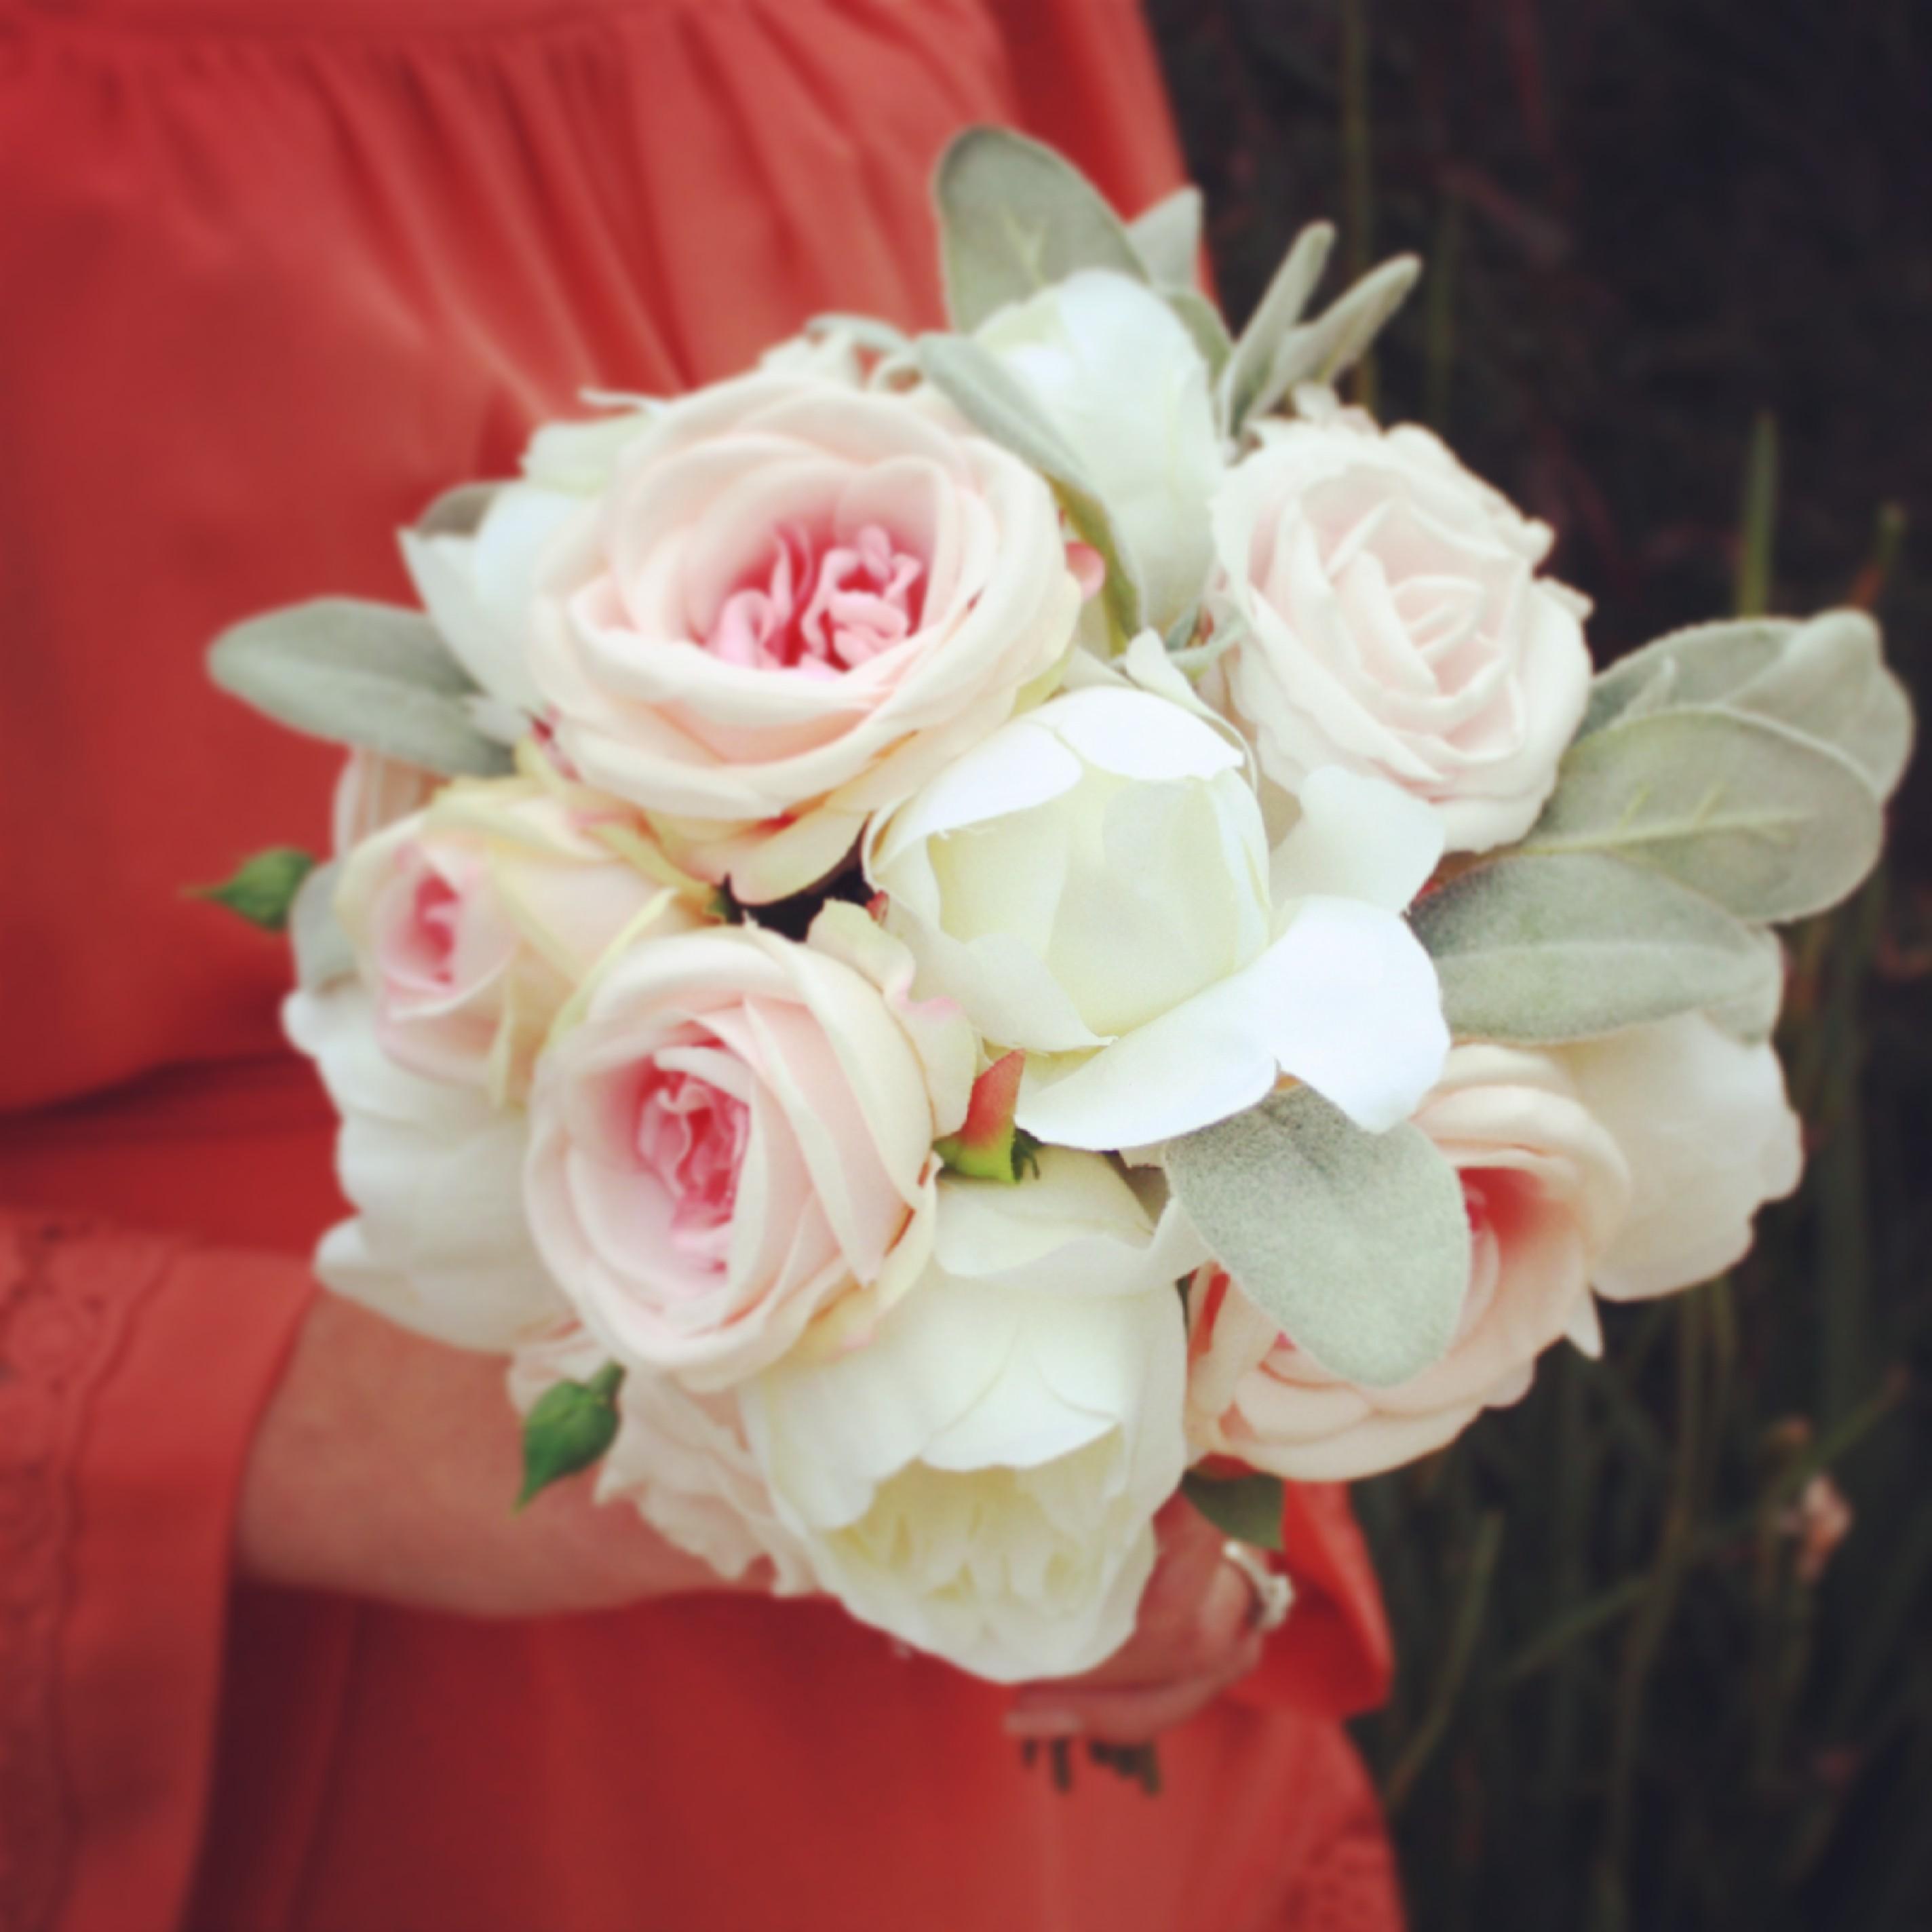 Roses & Peonies Bouquet